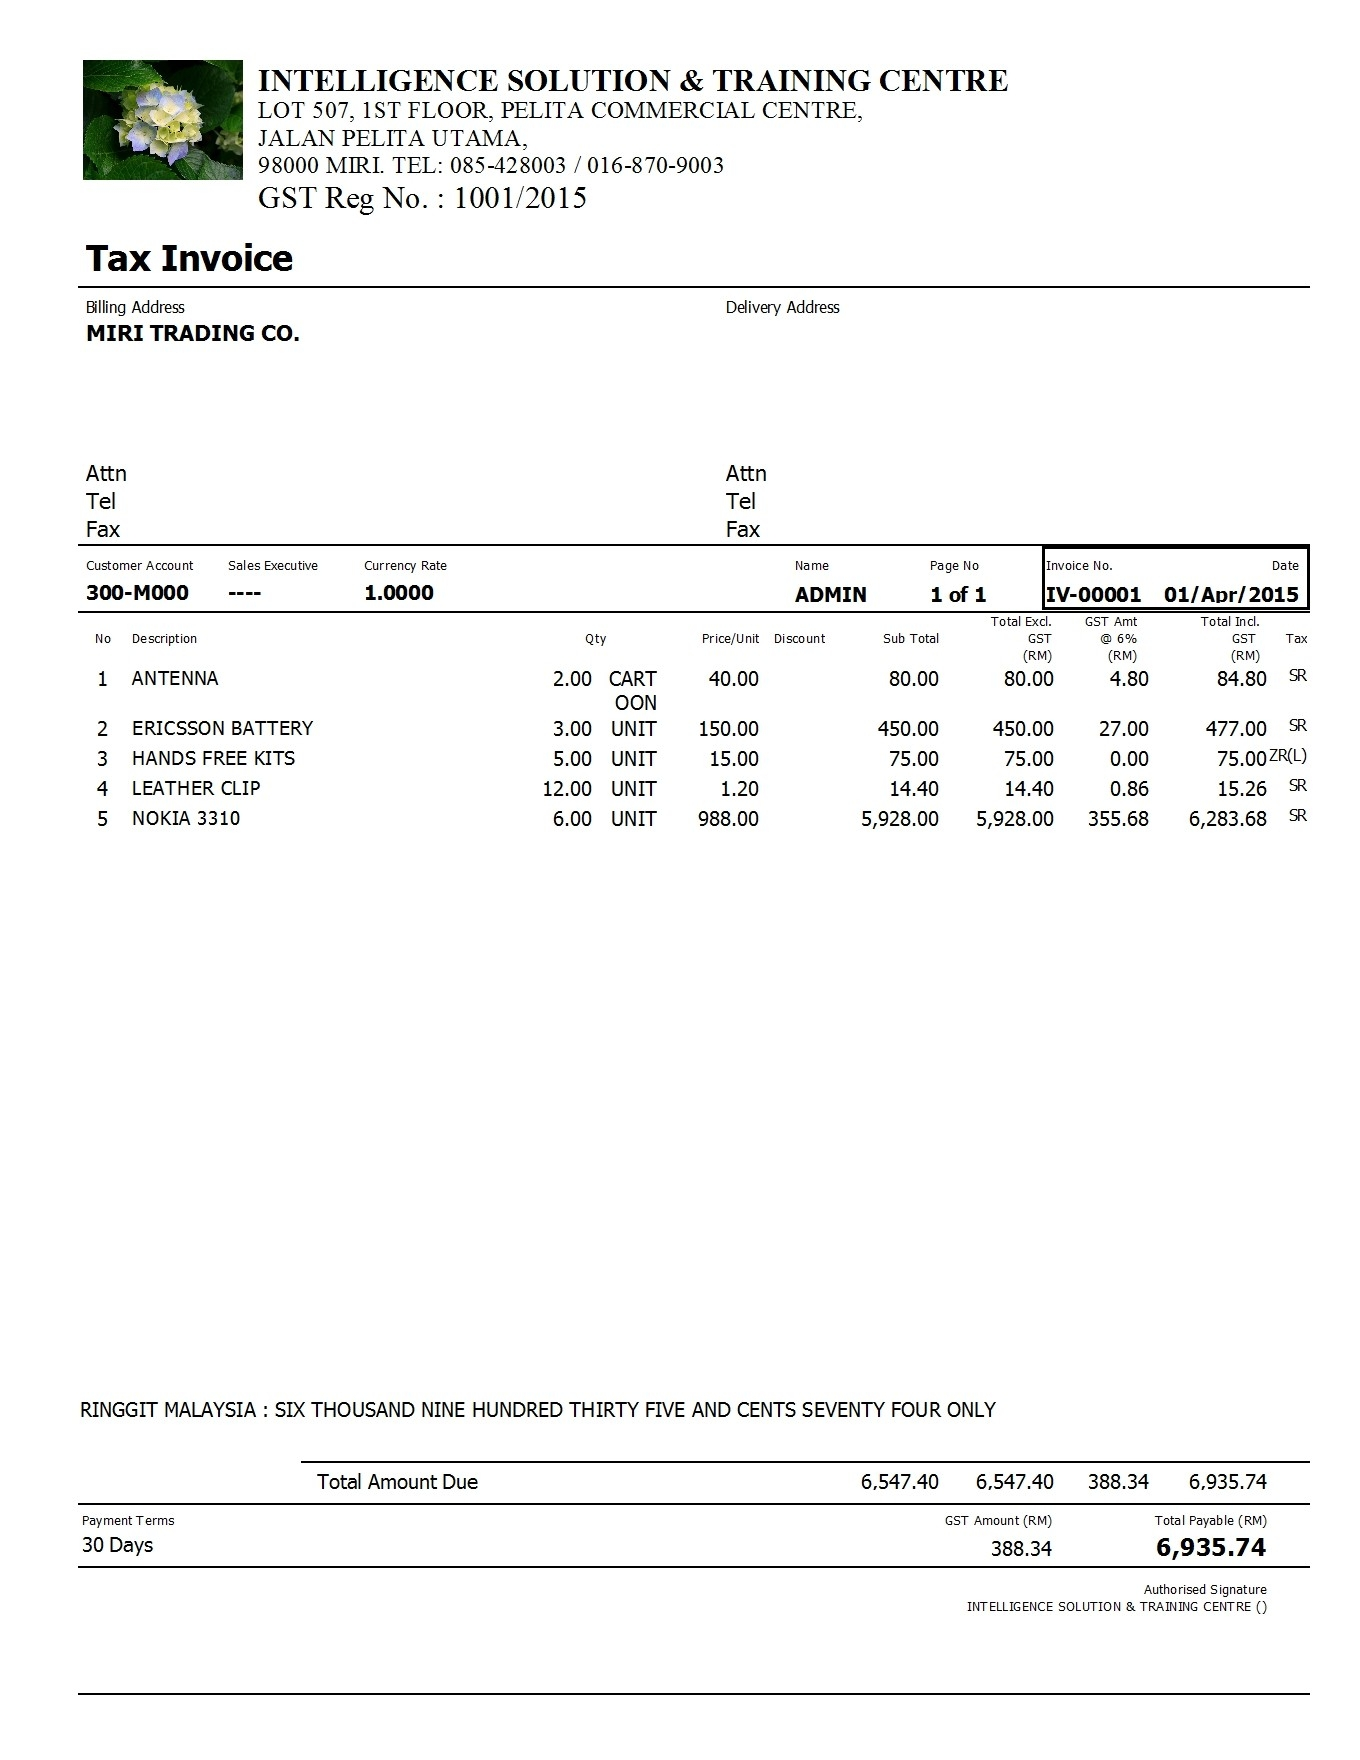 tax invoice example gst istc 1360 X 1760